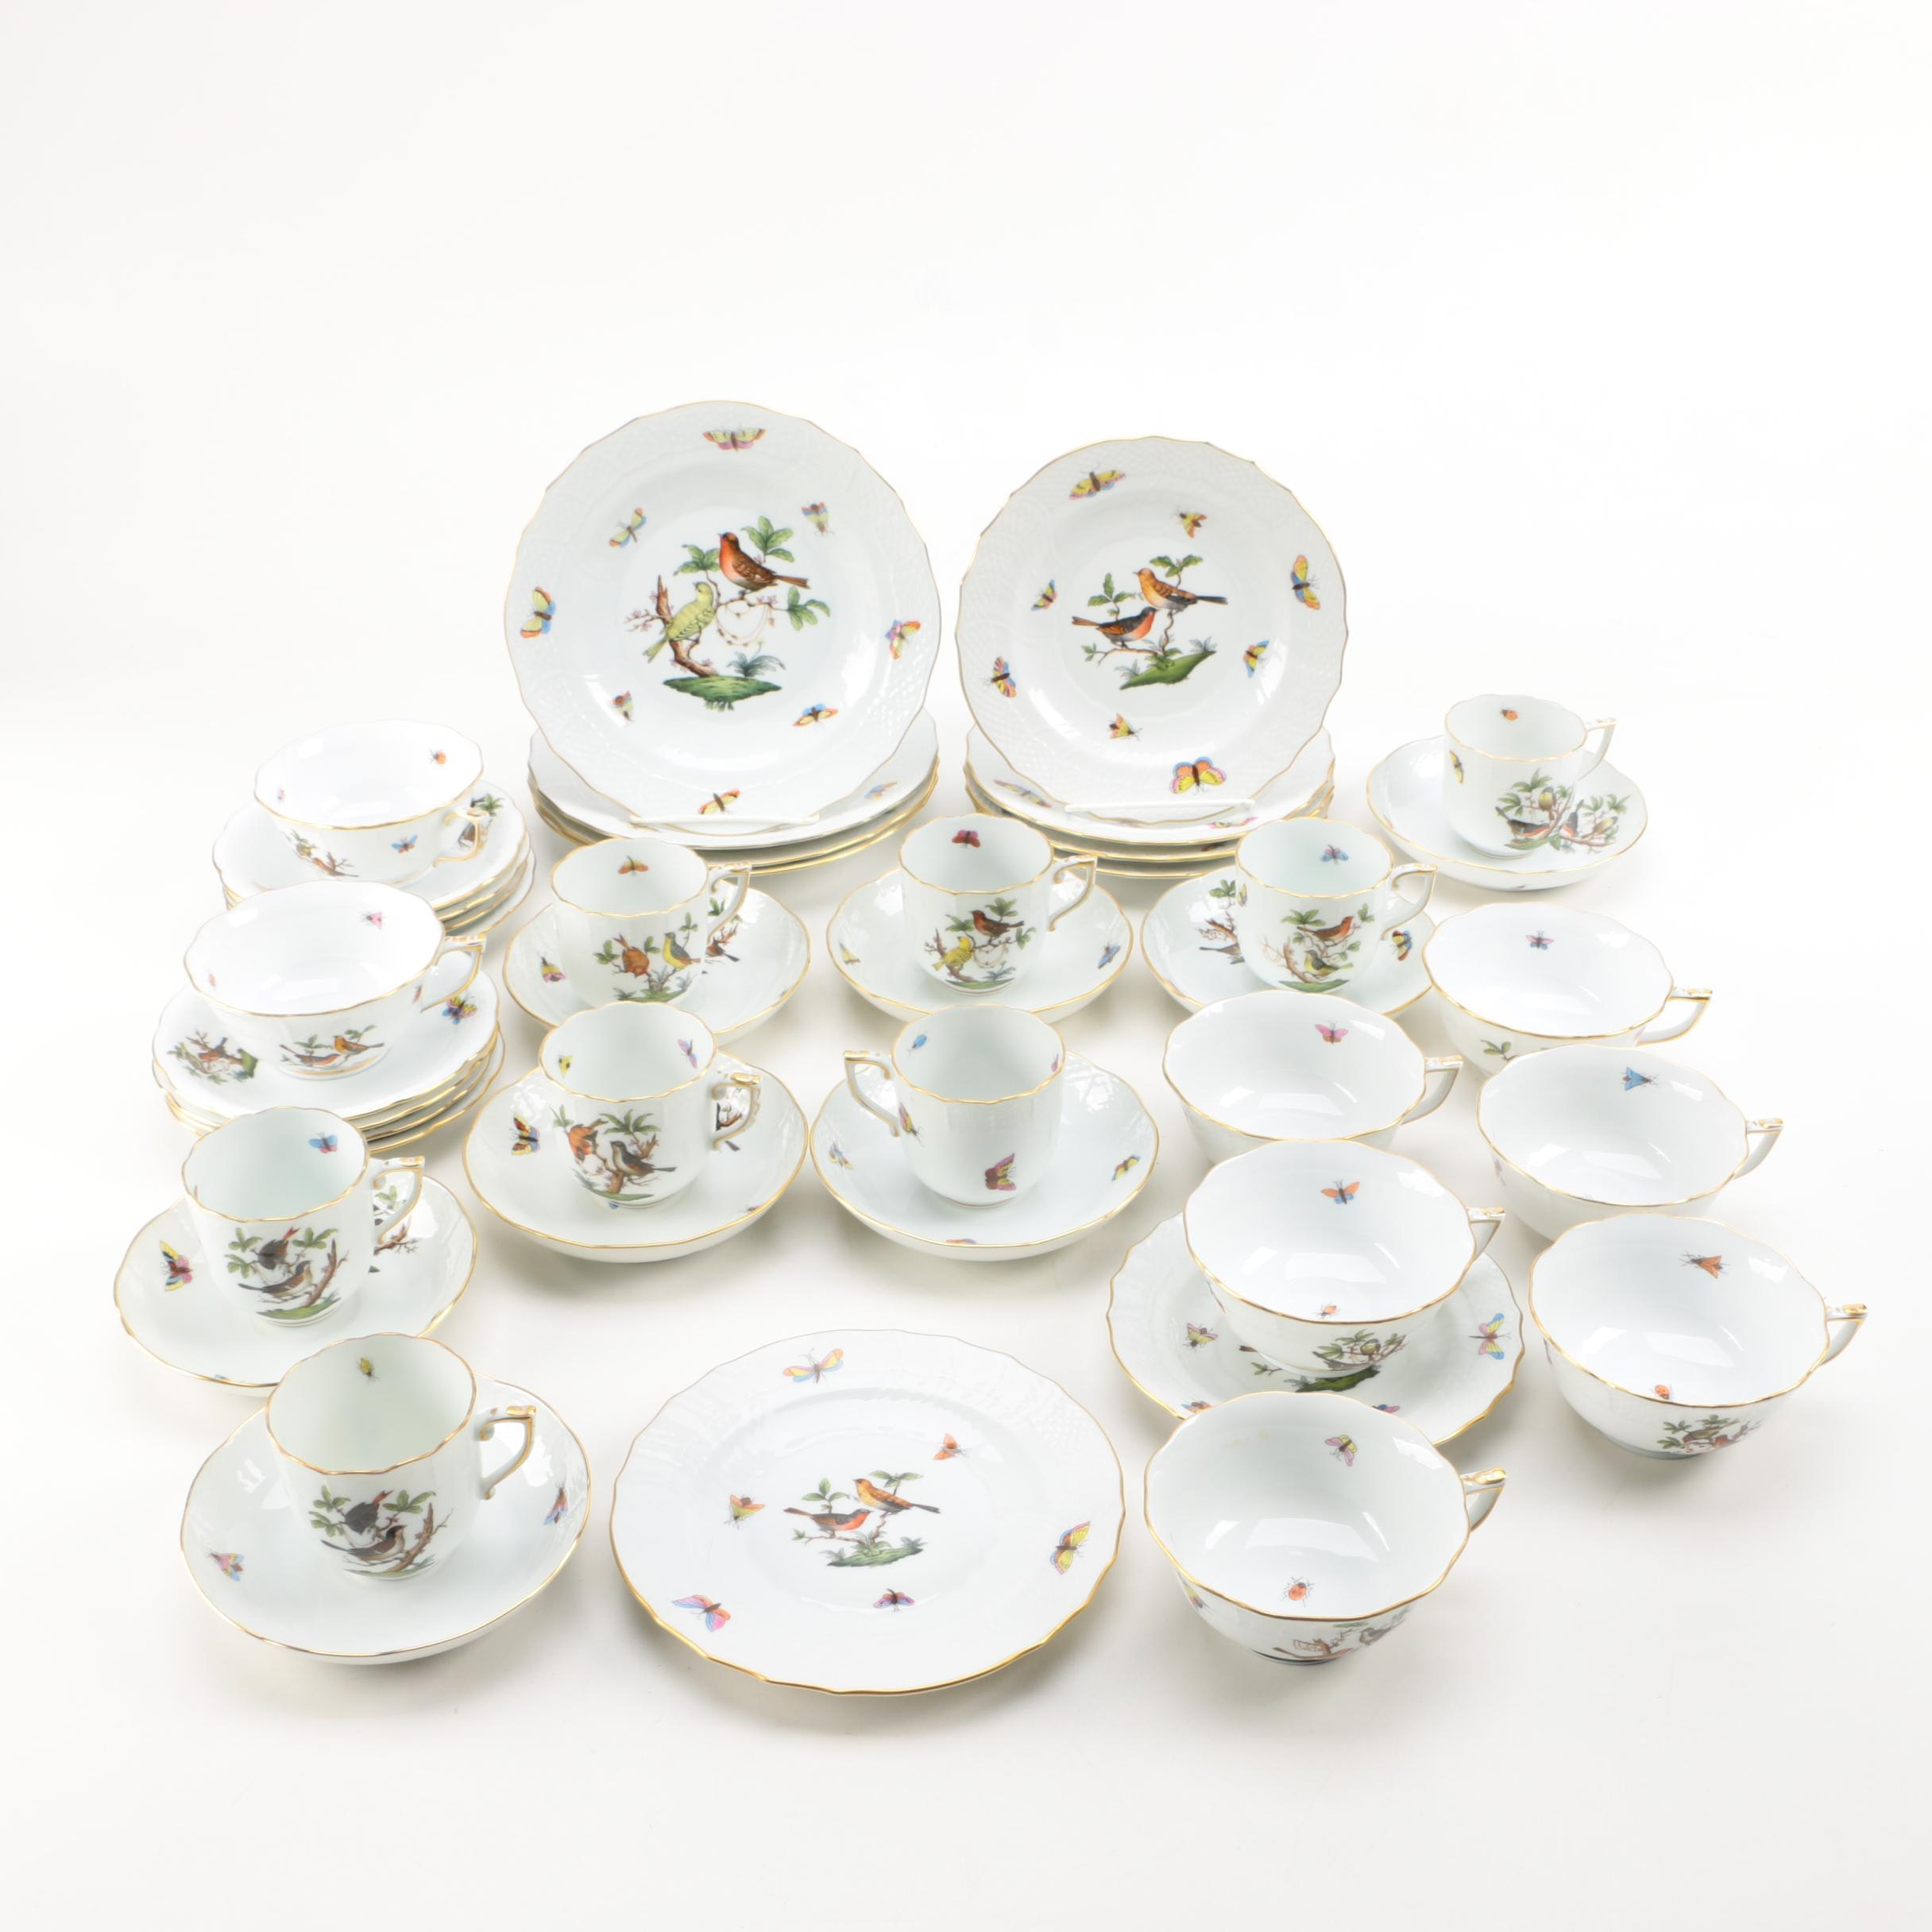 "Early 20th Century Herend ""Rothschild Bird"" Porcelain Tableware"